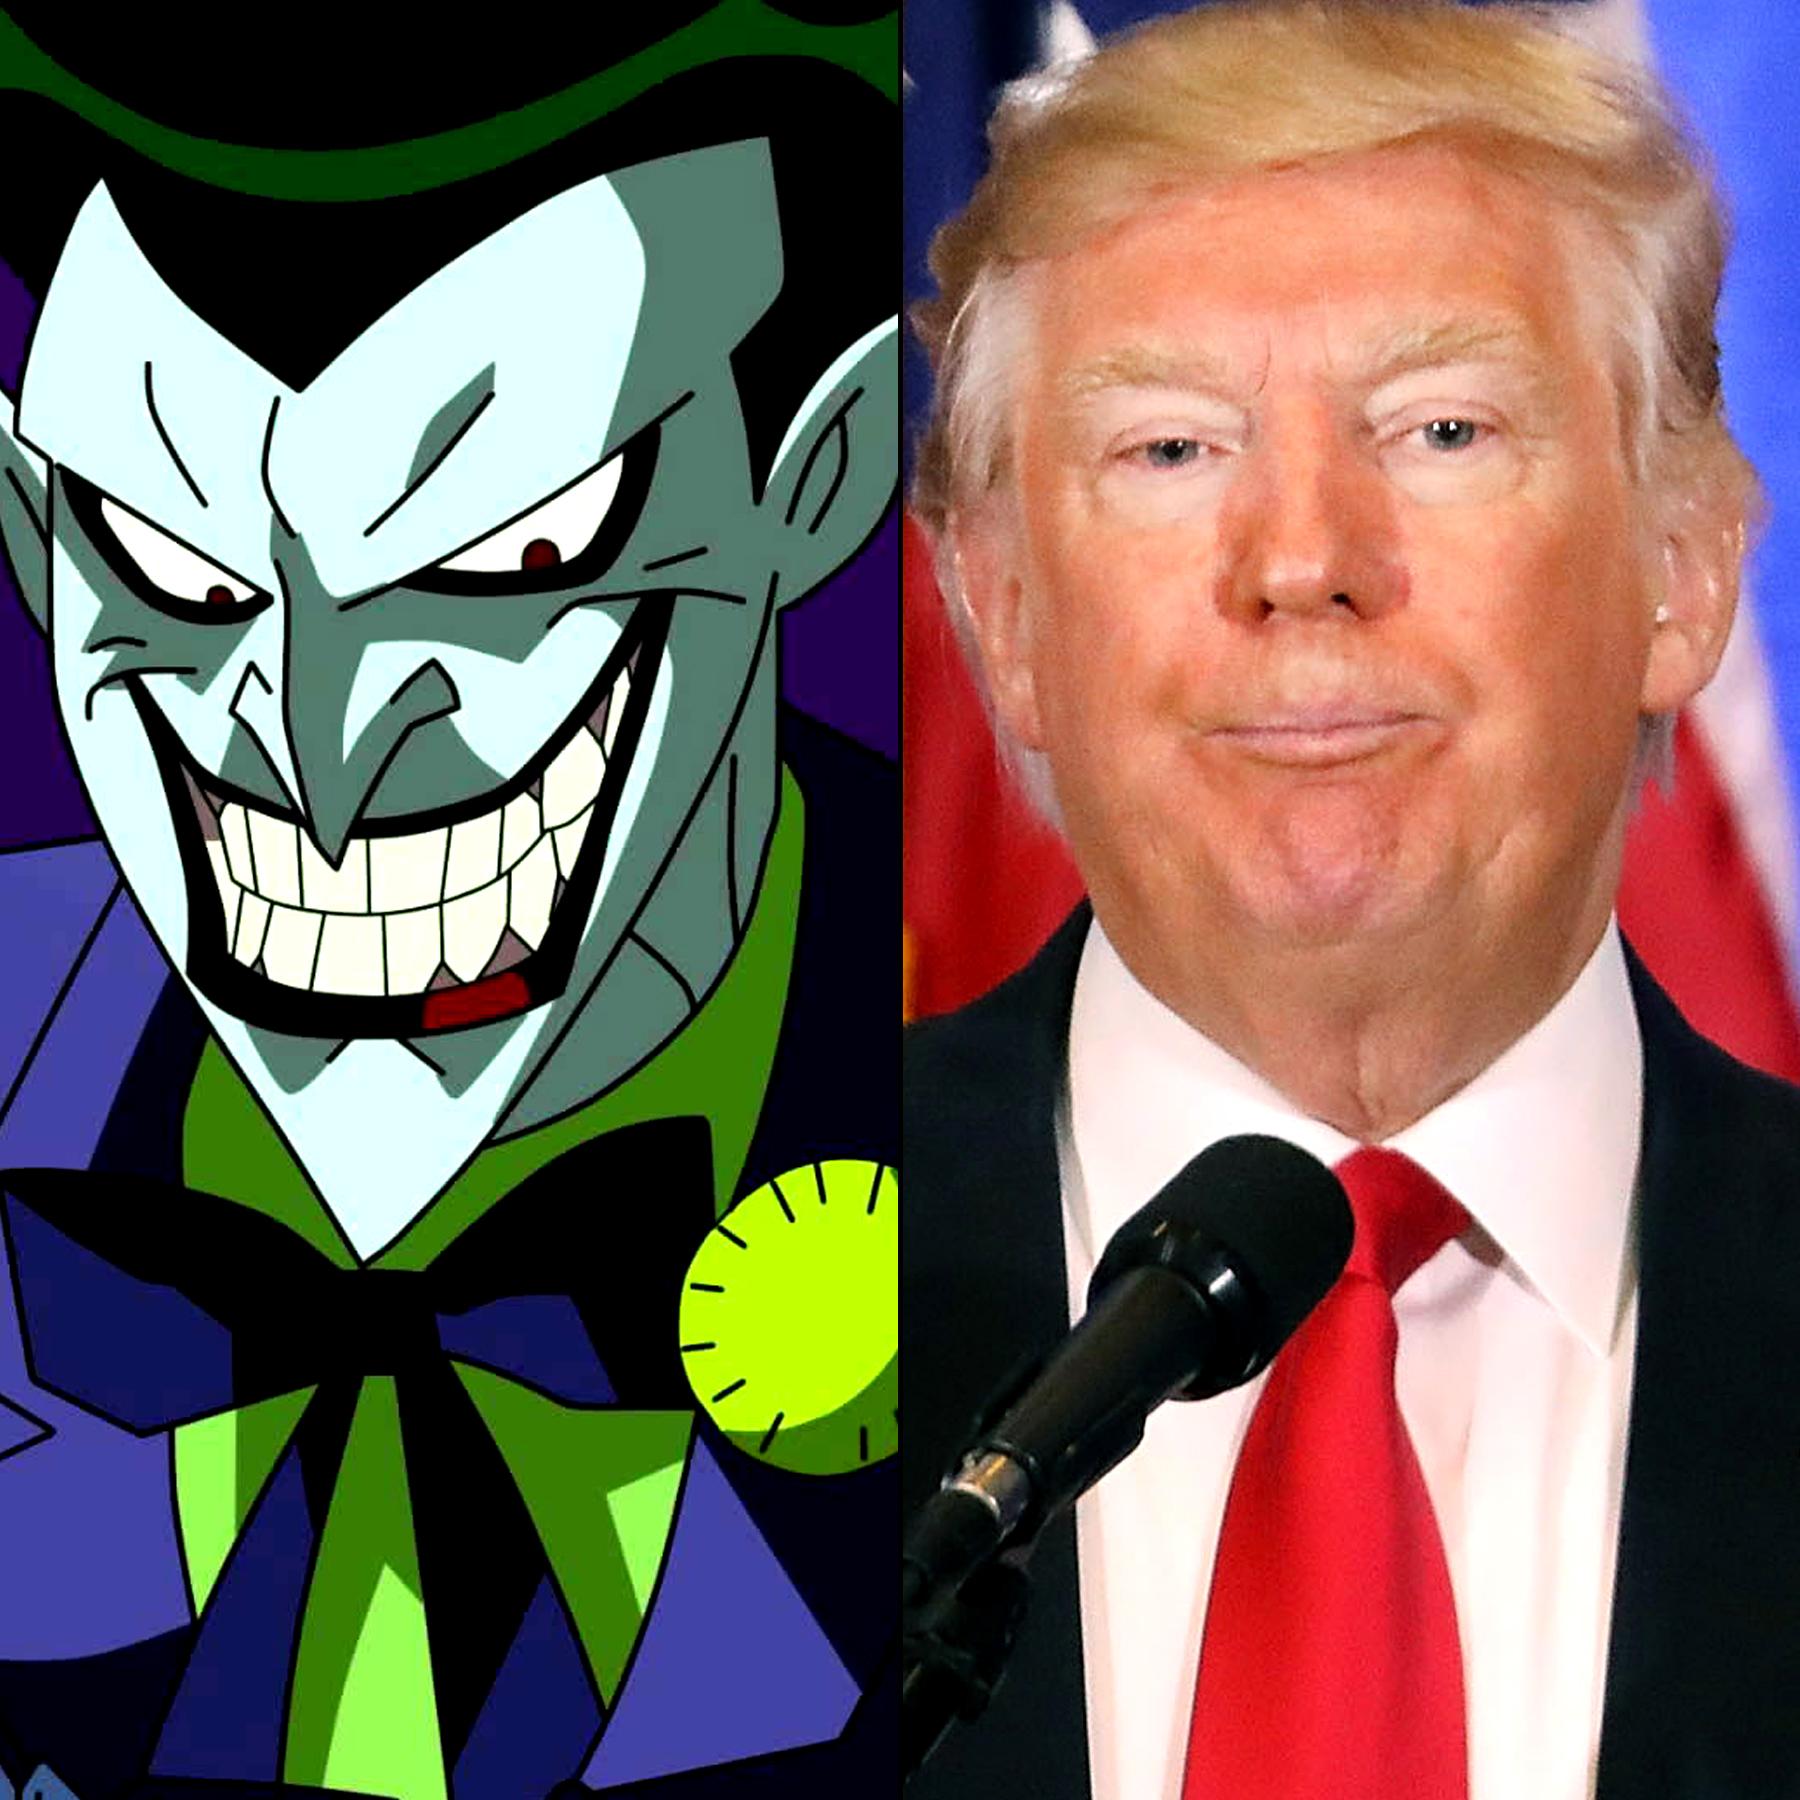 joker_trump